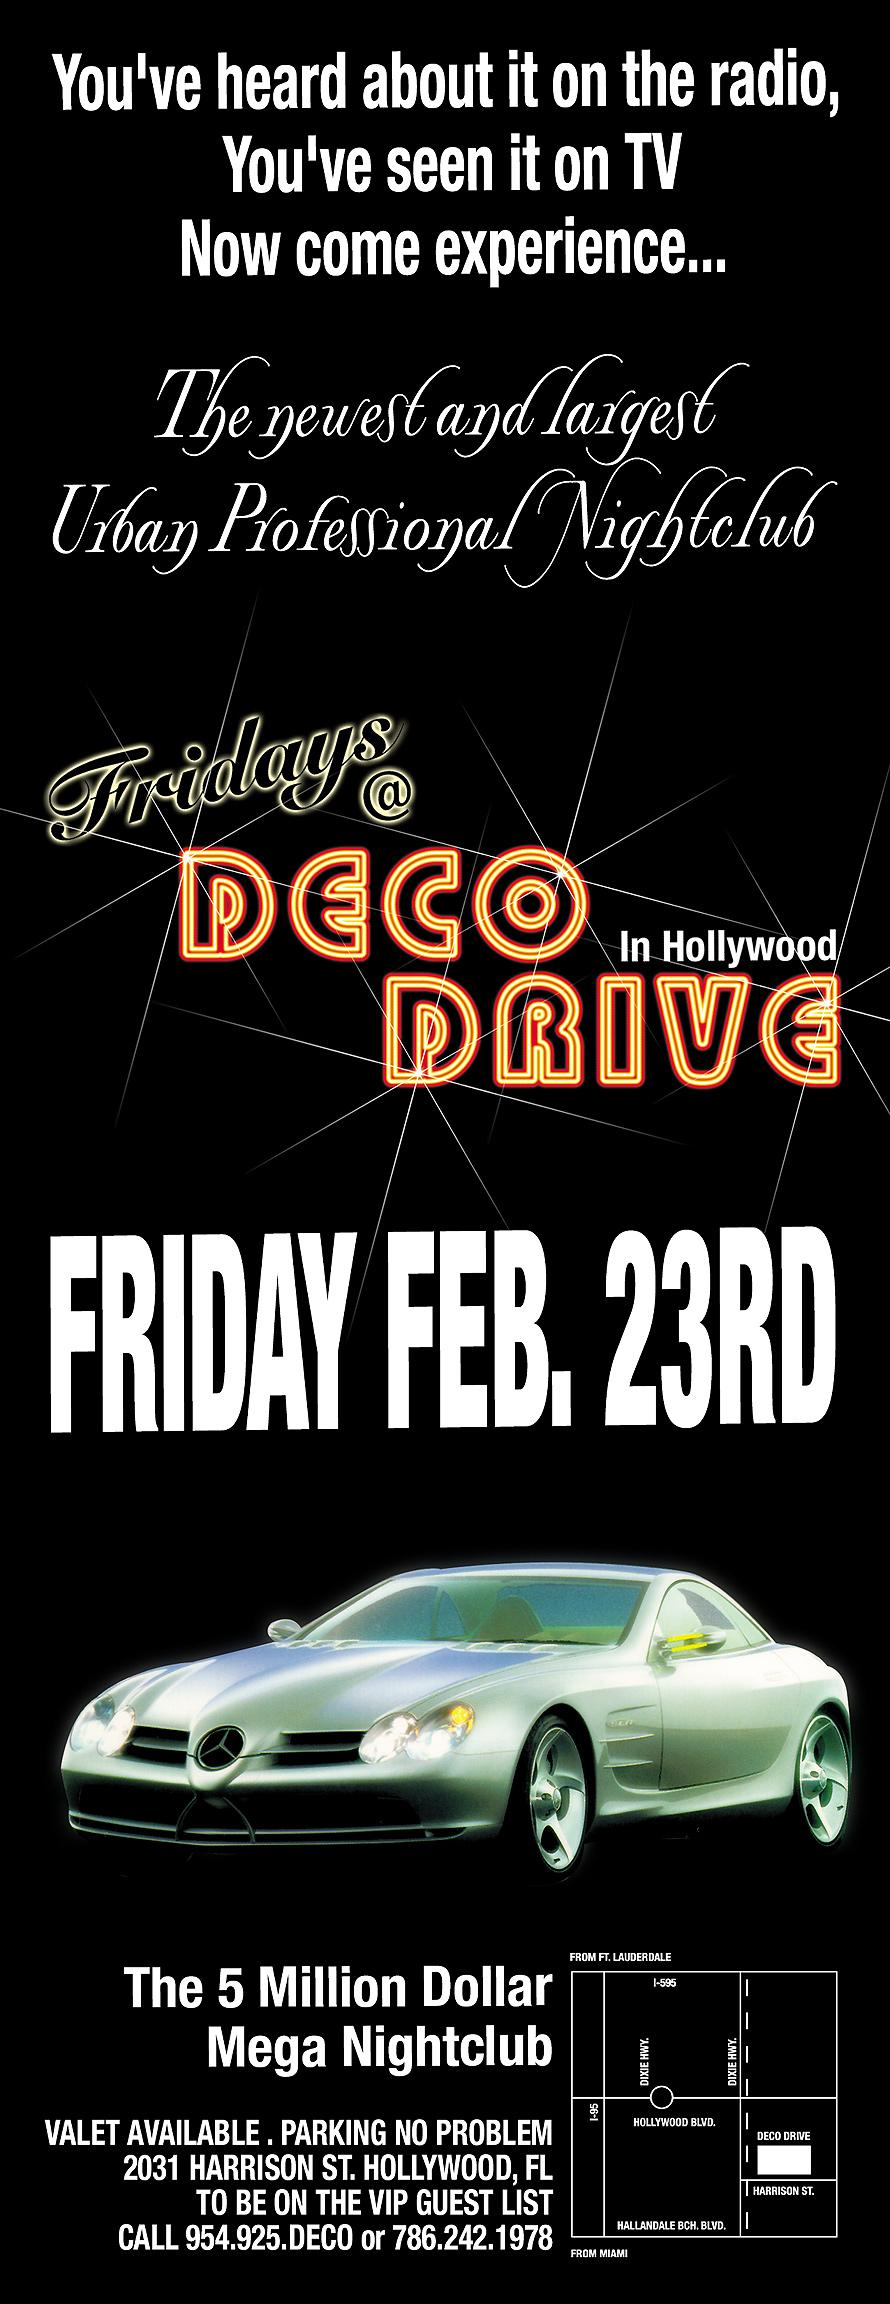 Fridays at Deco Drive